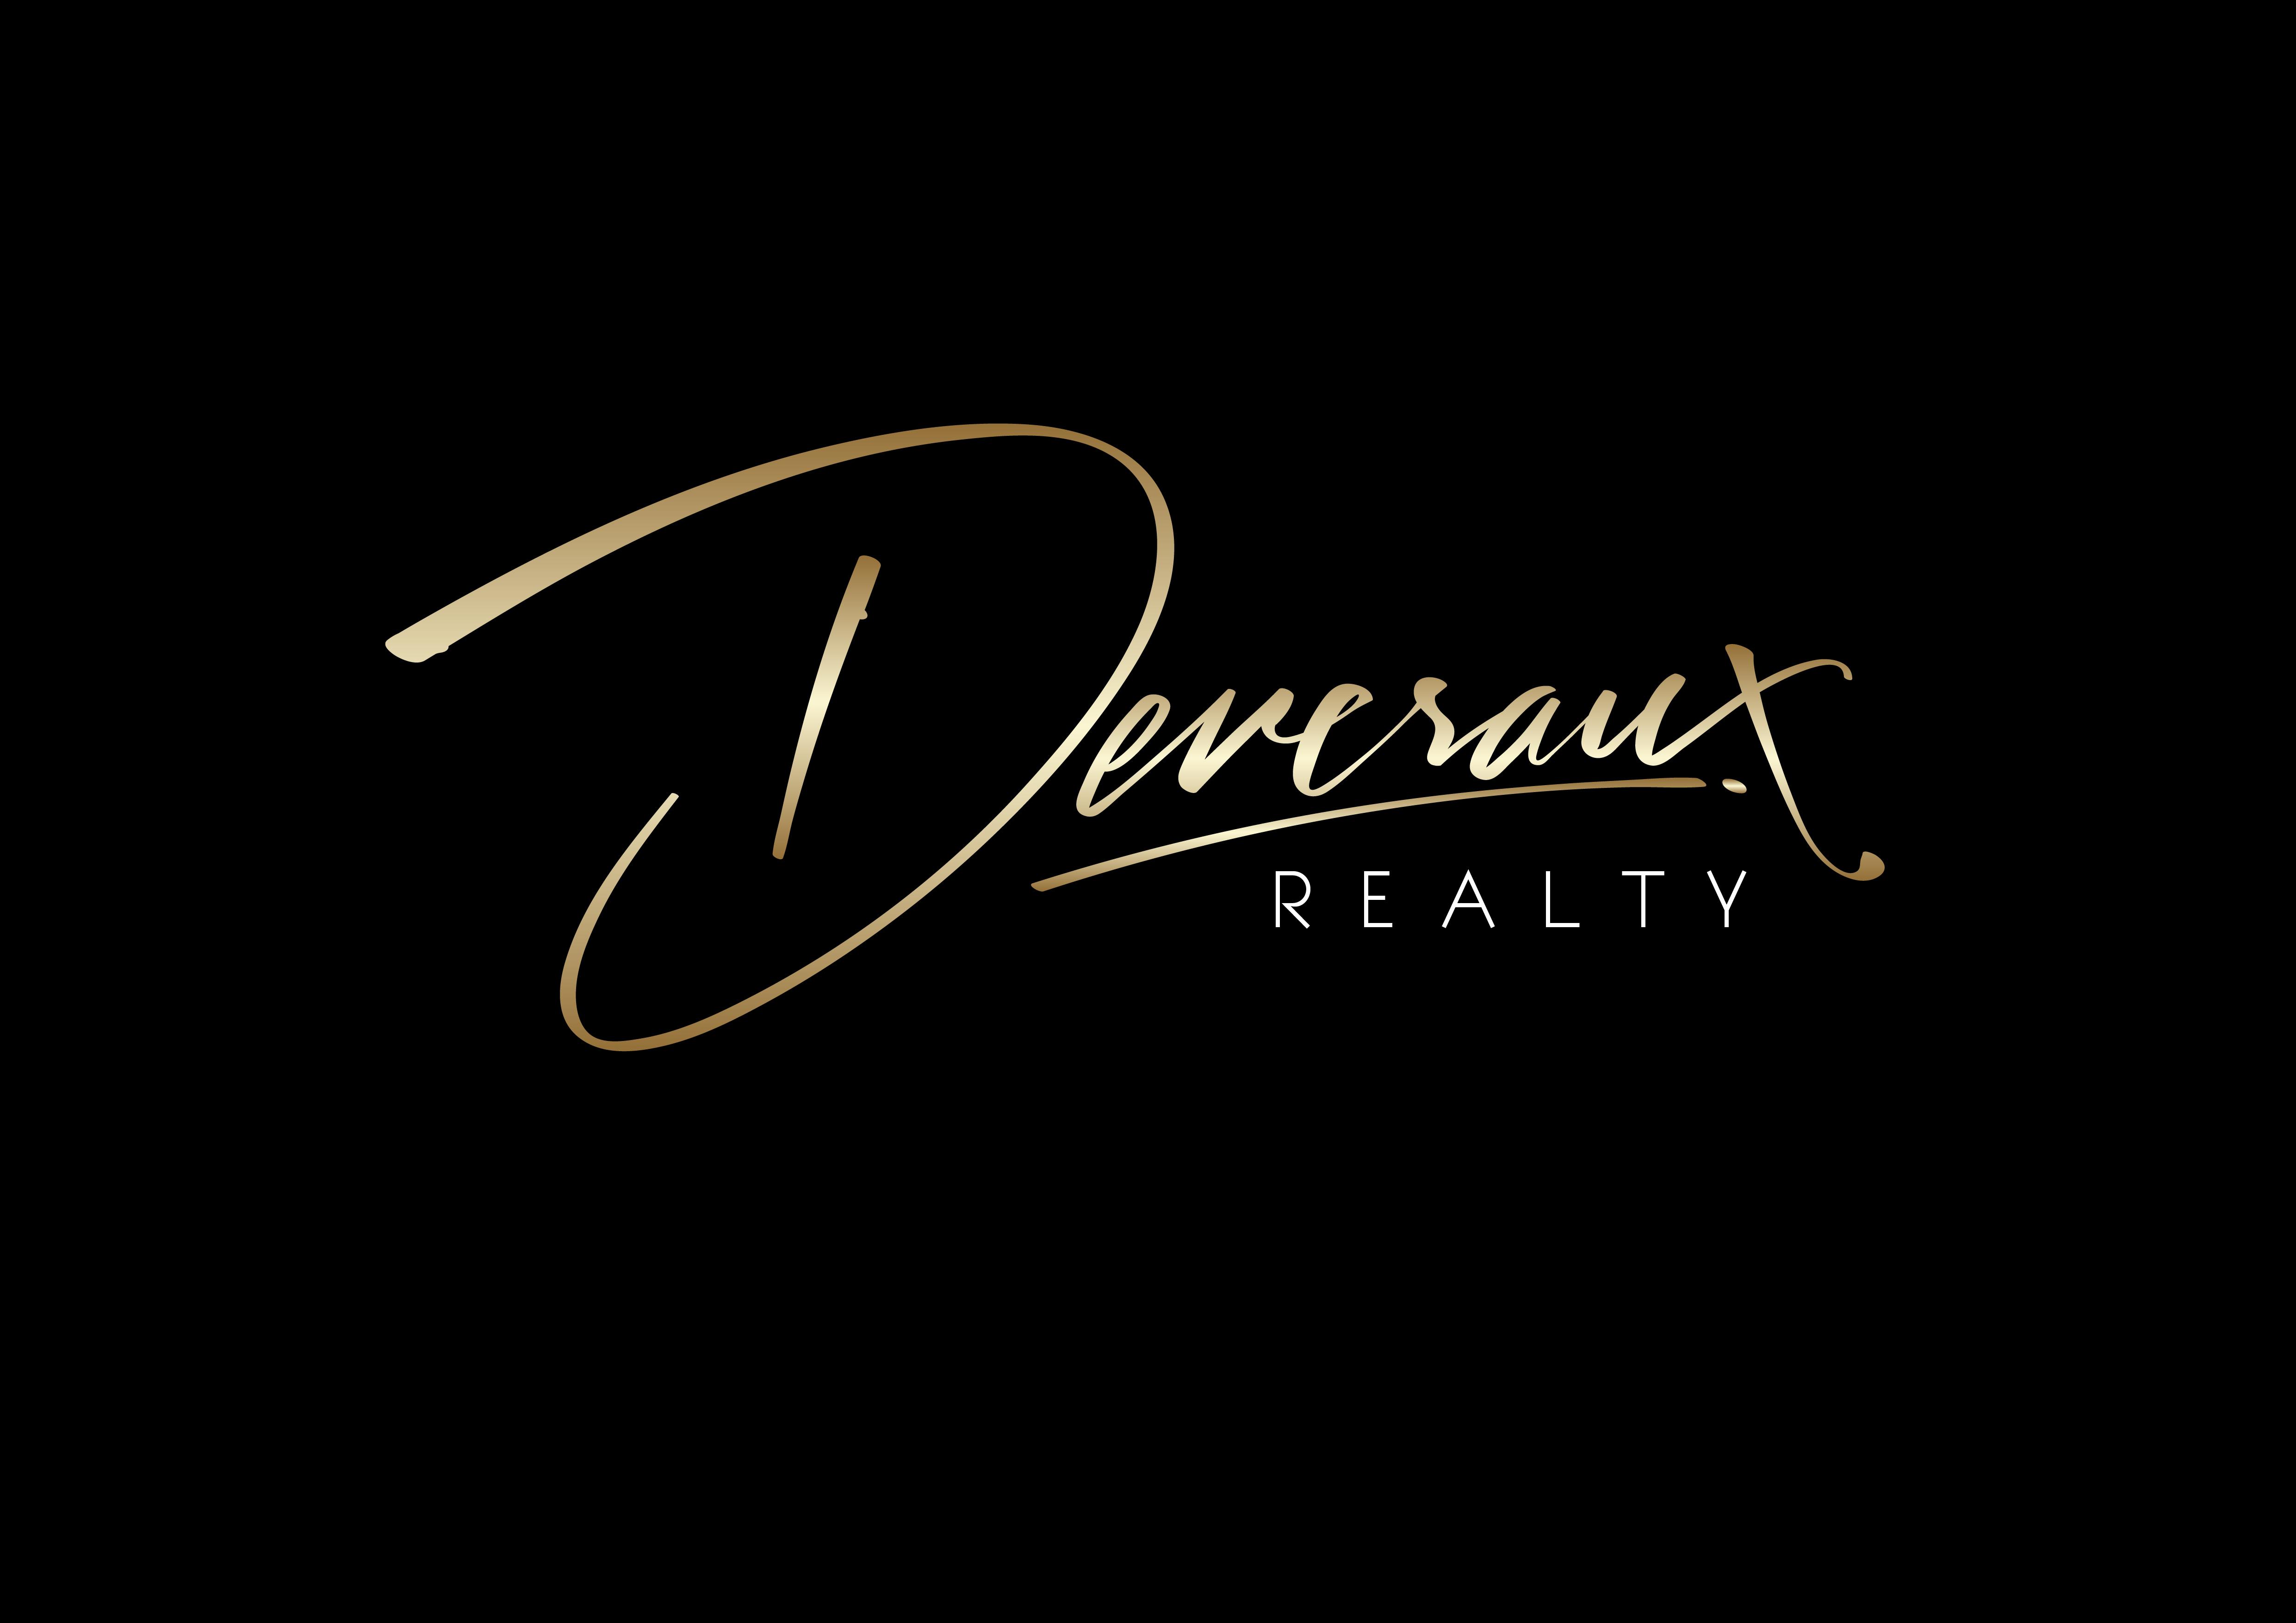 Deveraux Realty